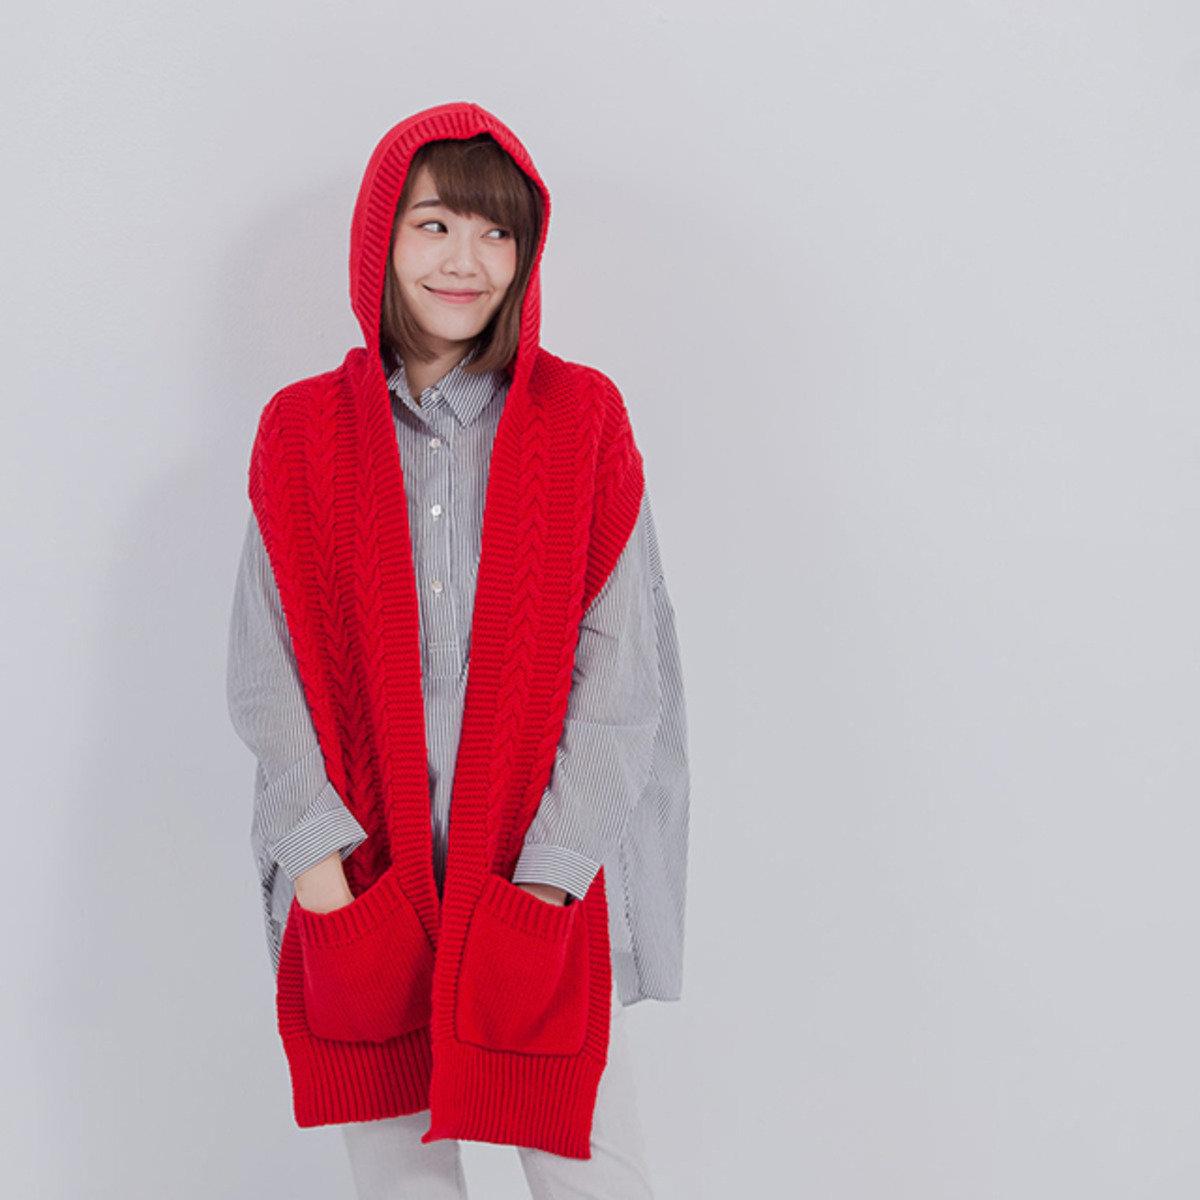 Goody 連帽針織圍巾/紅